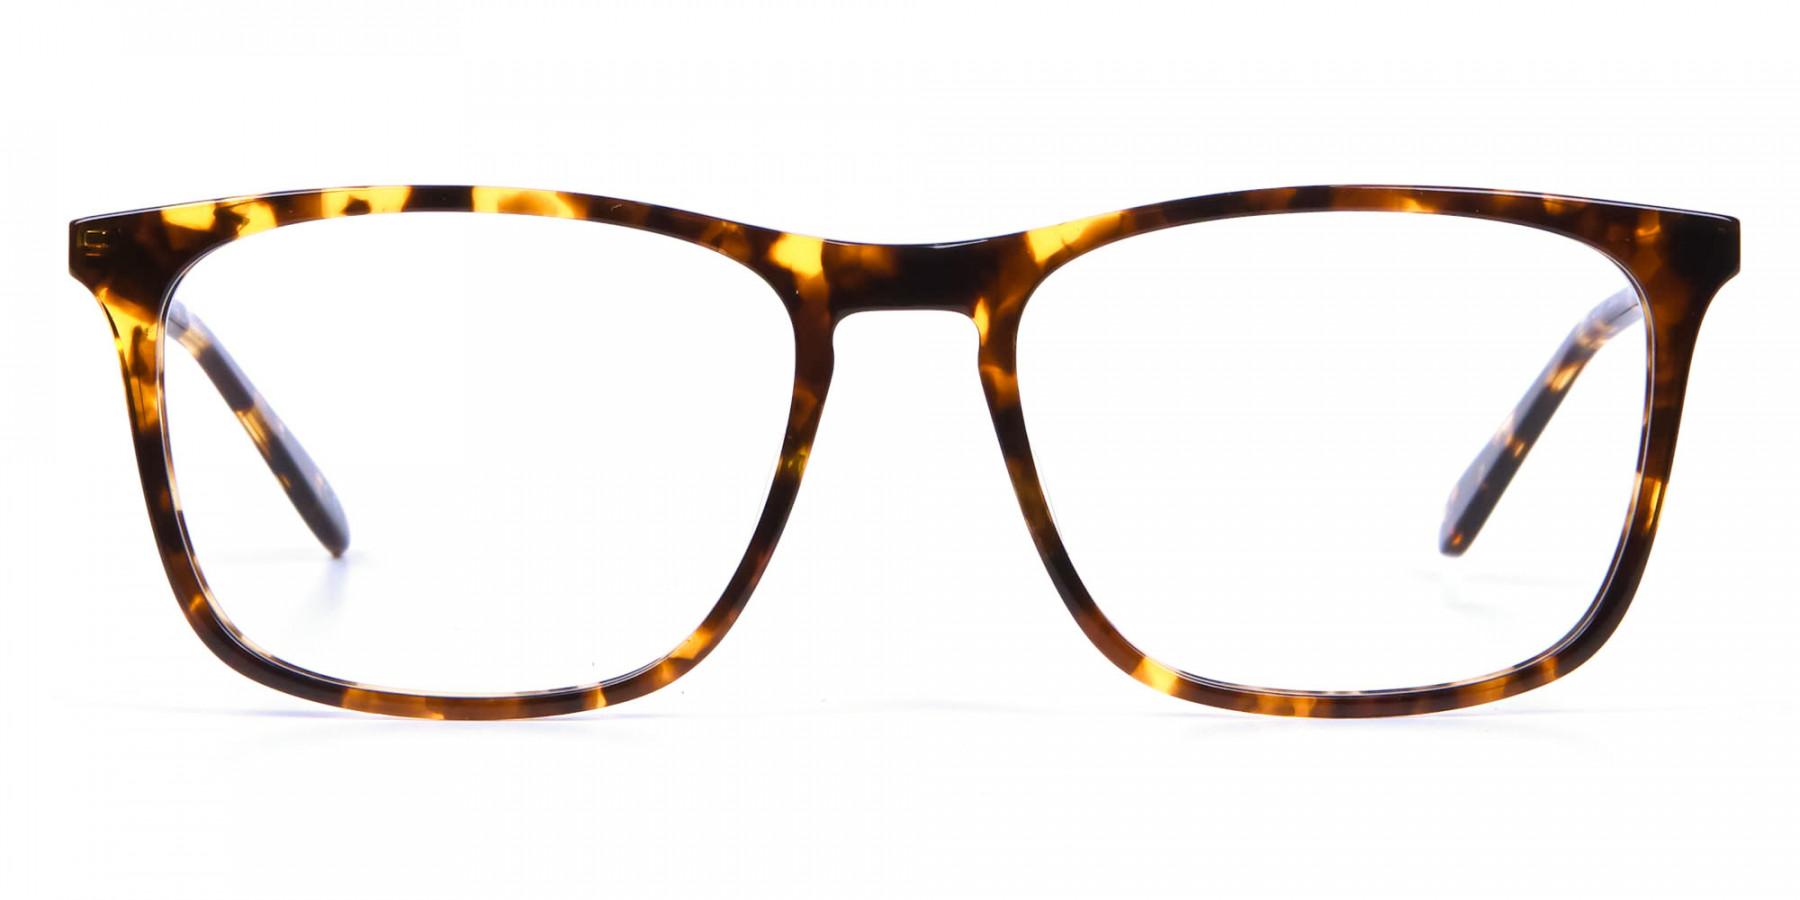 Tortoiseshell Glasses with Metal Arms